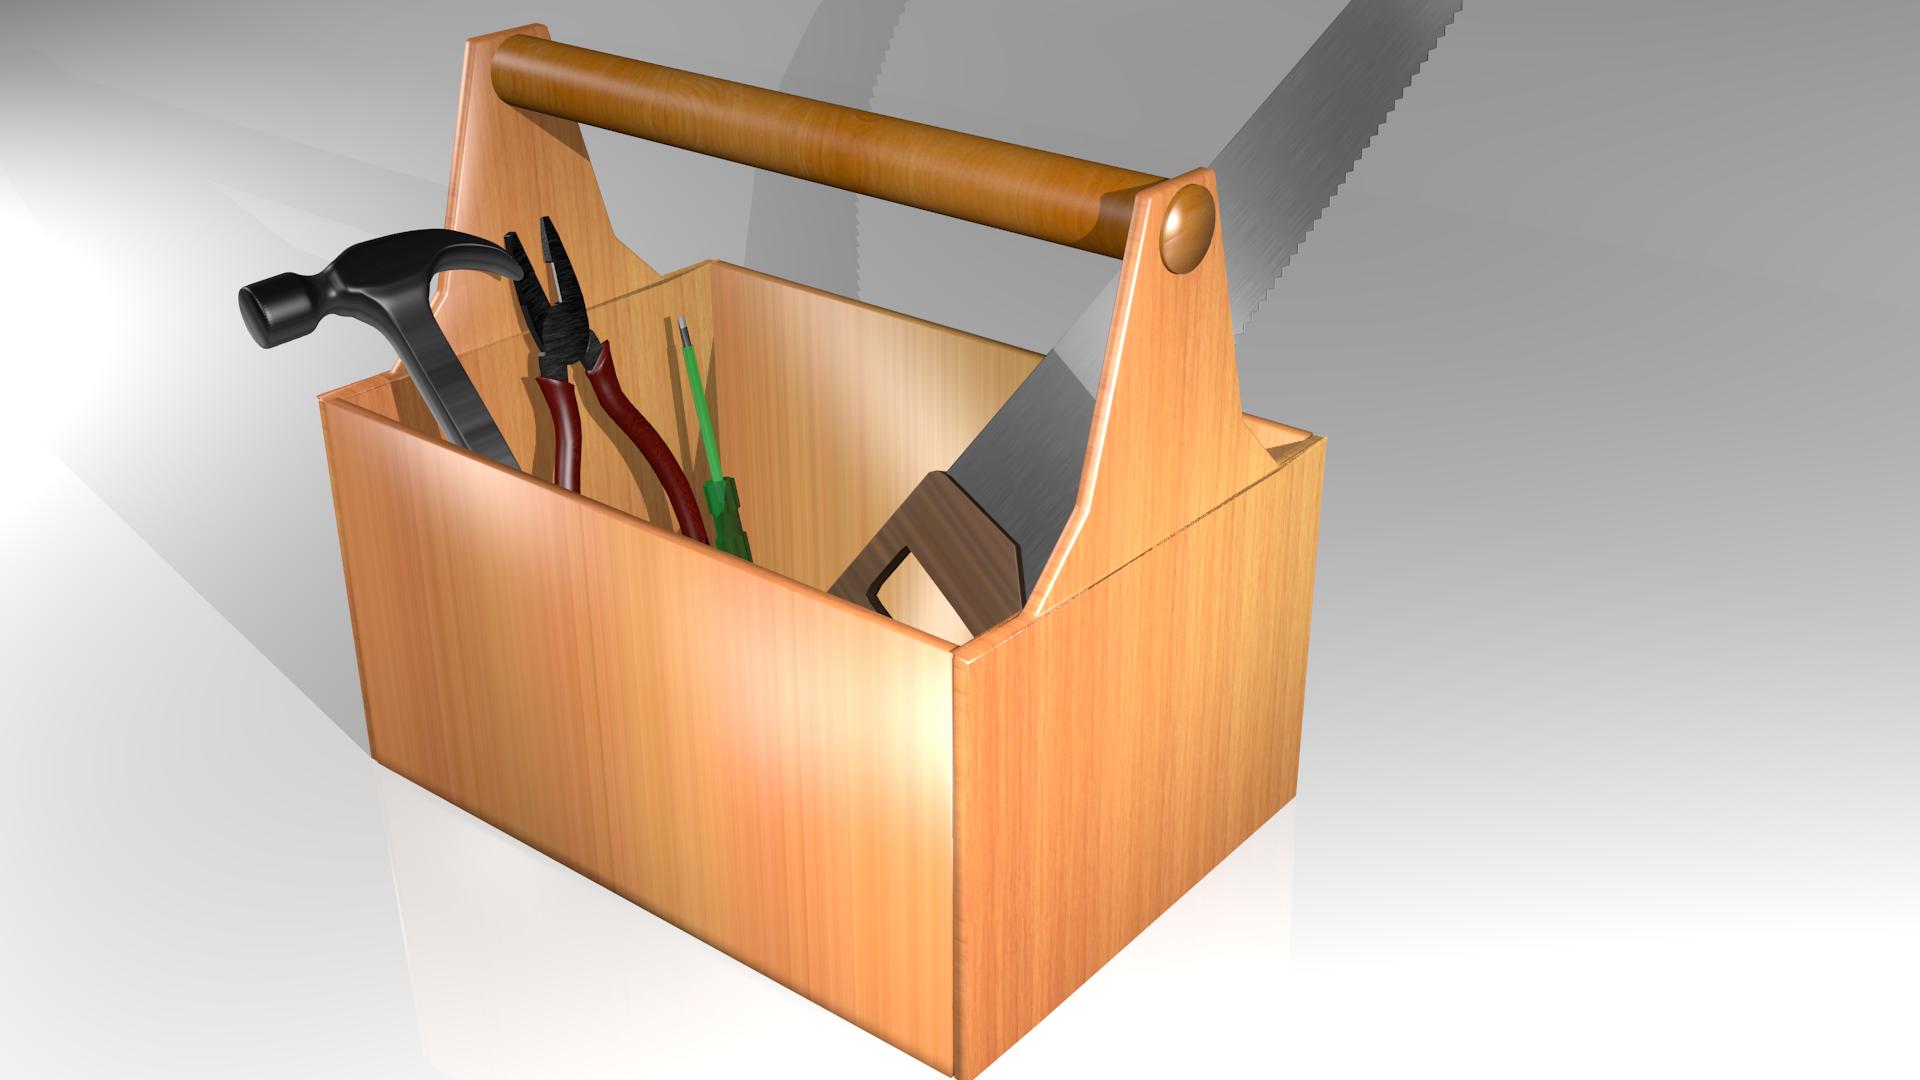 Tool Box 3d Model Blend